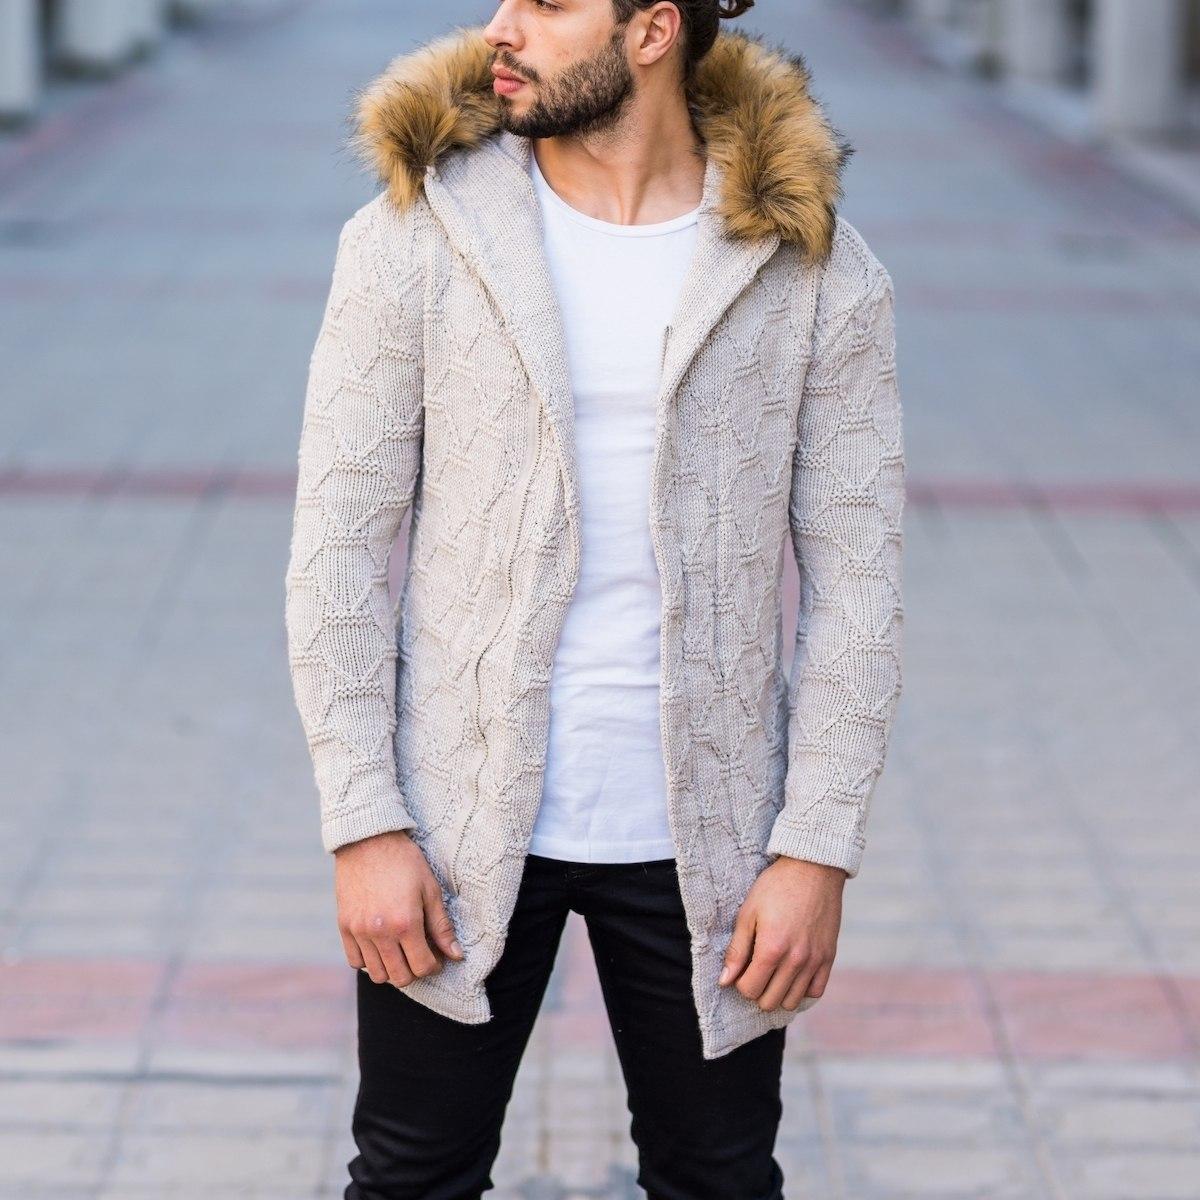 Men's Furry Hooded Cardigan In Beige